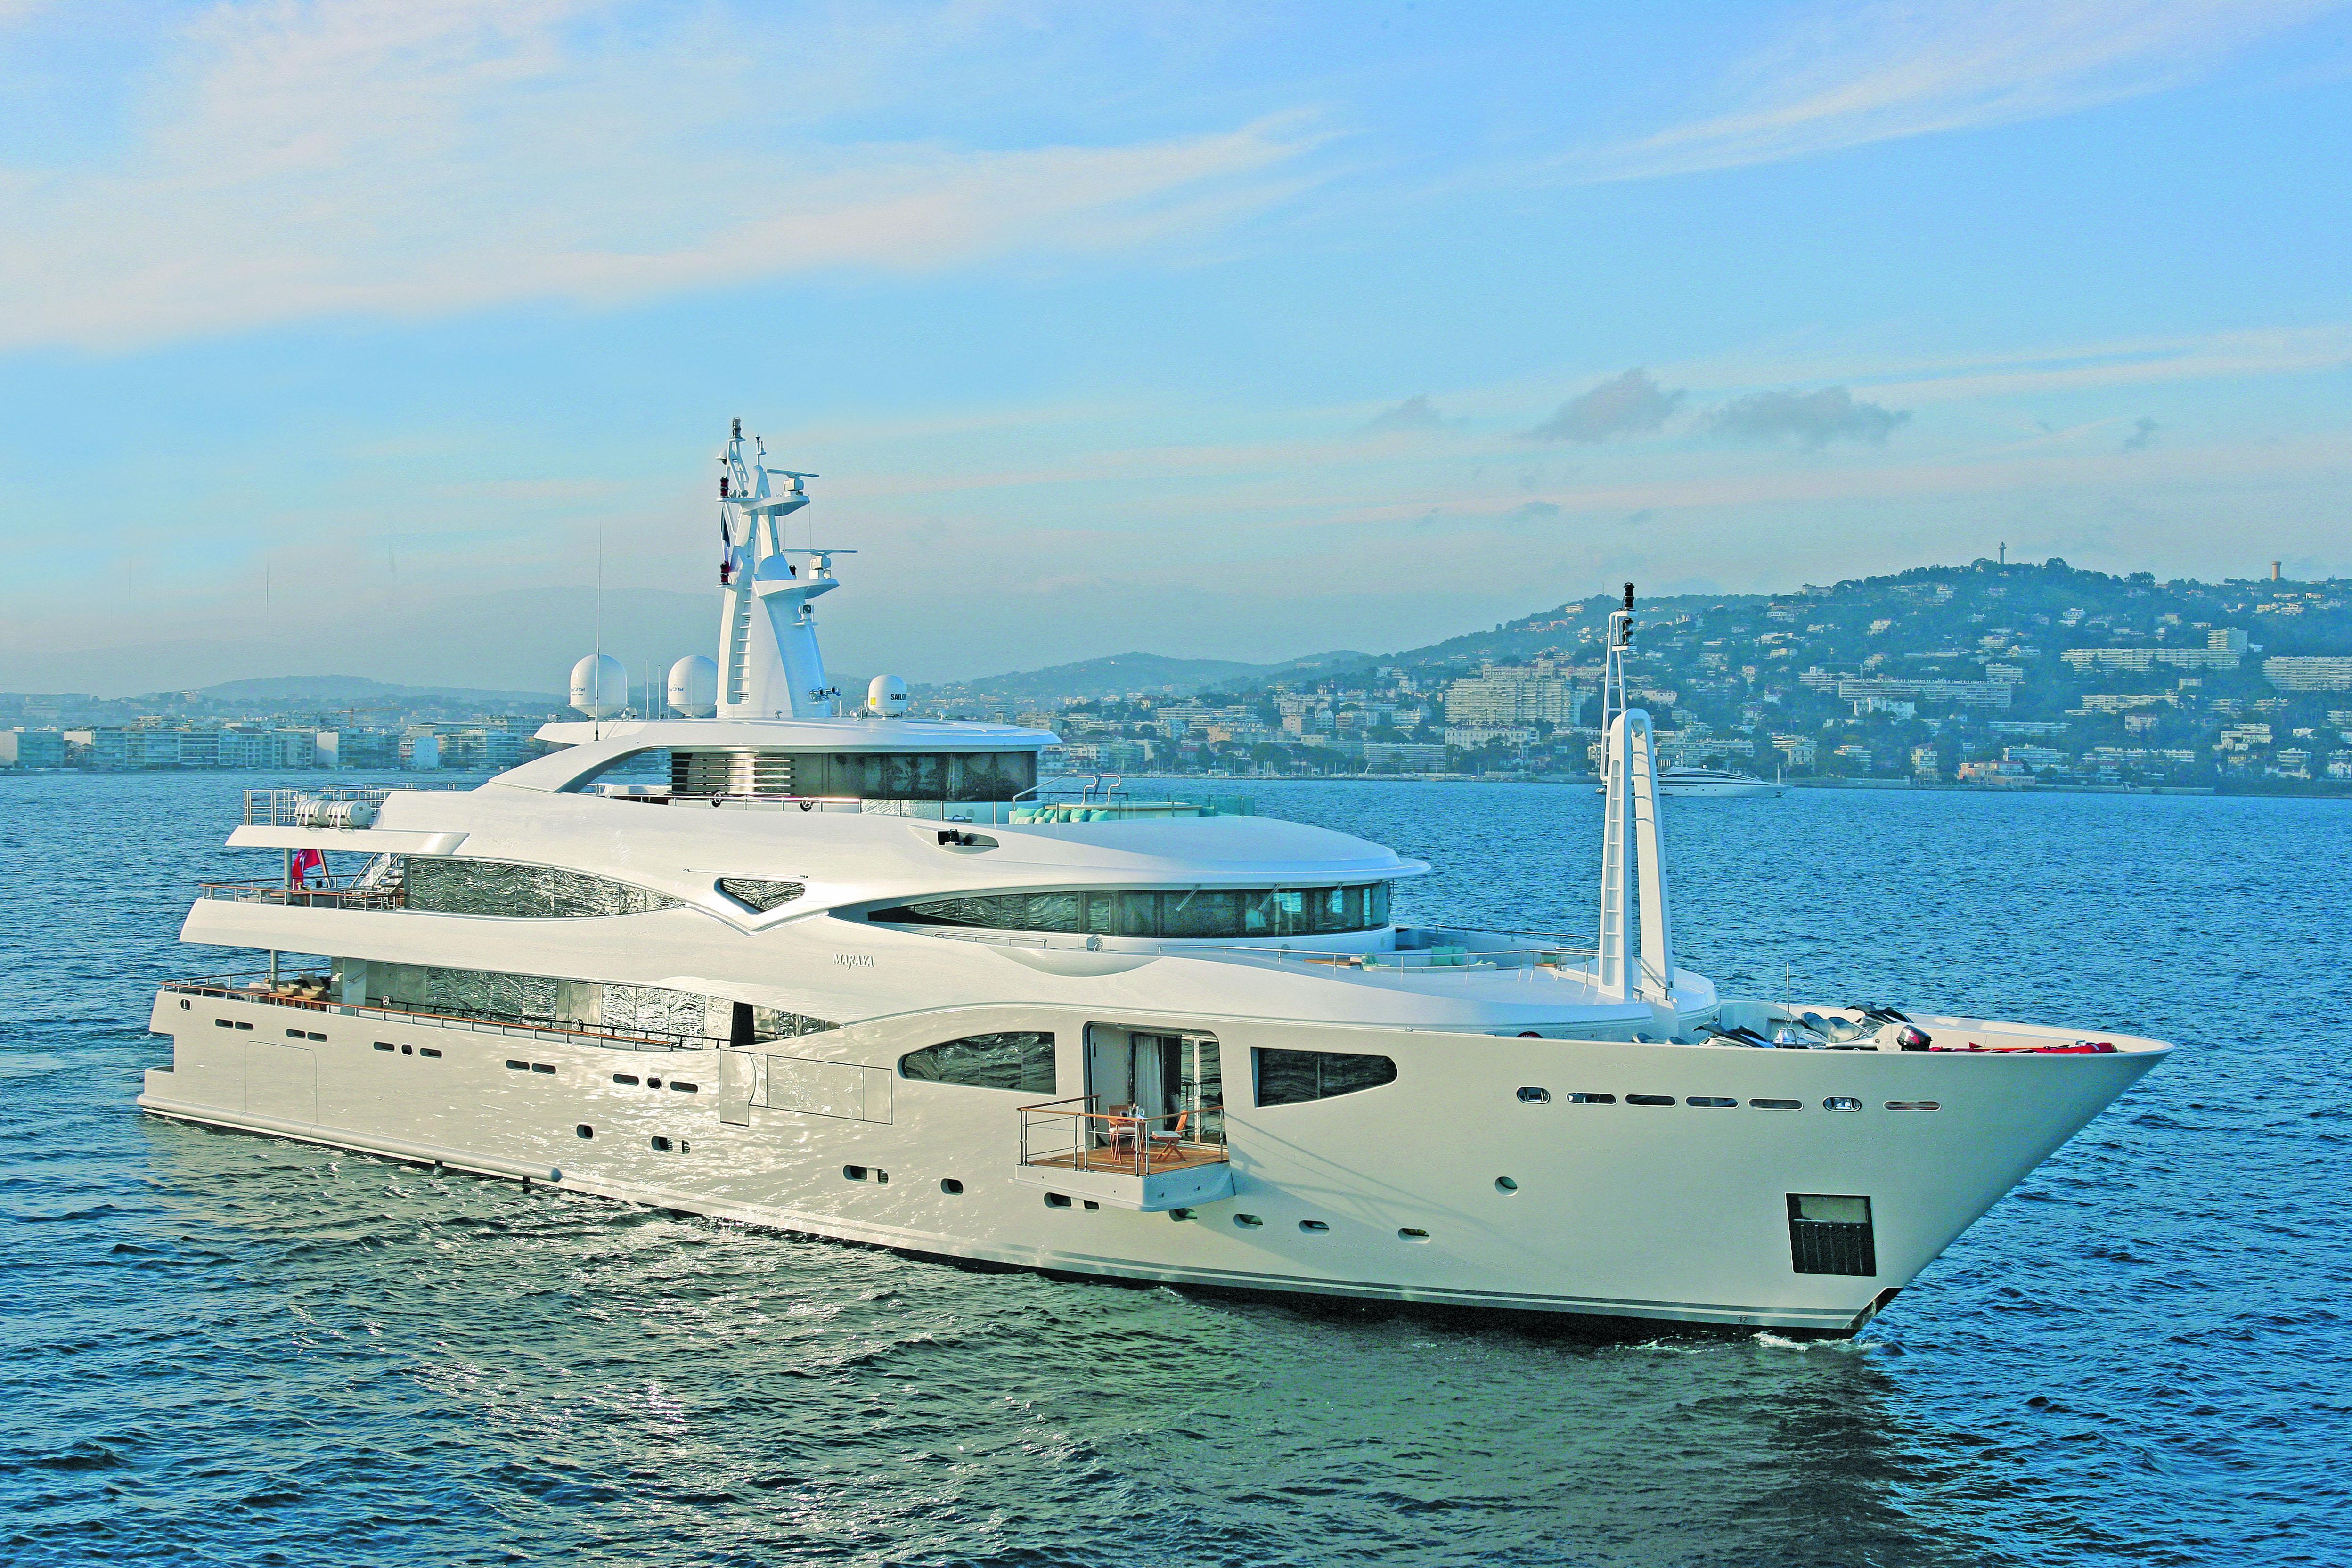 M/Y MARAYA yacht for charter at anchor